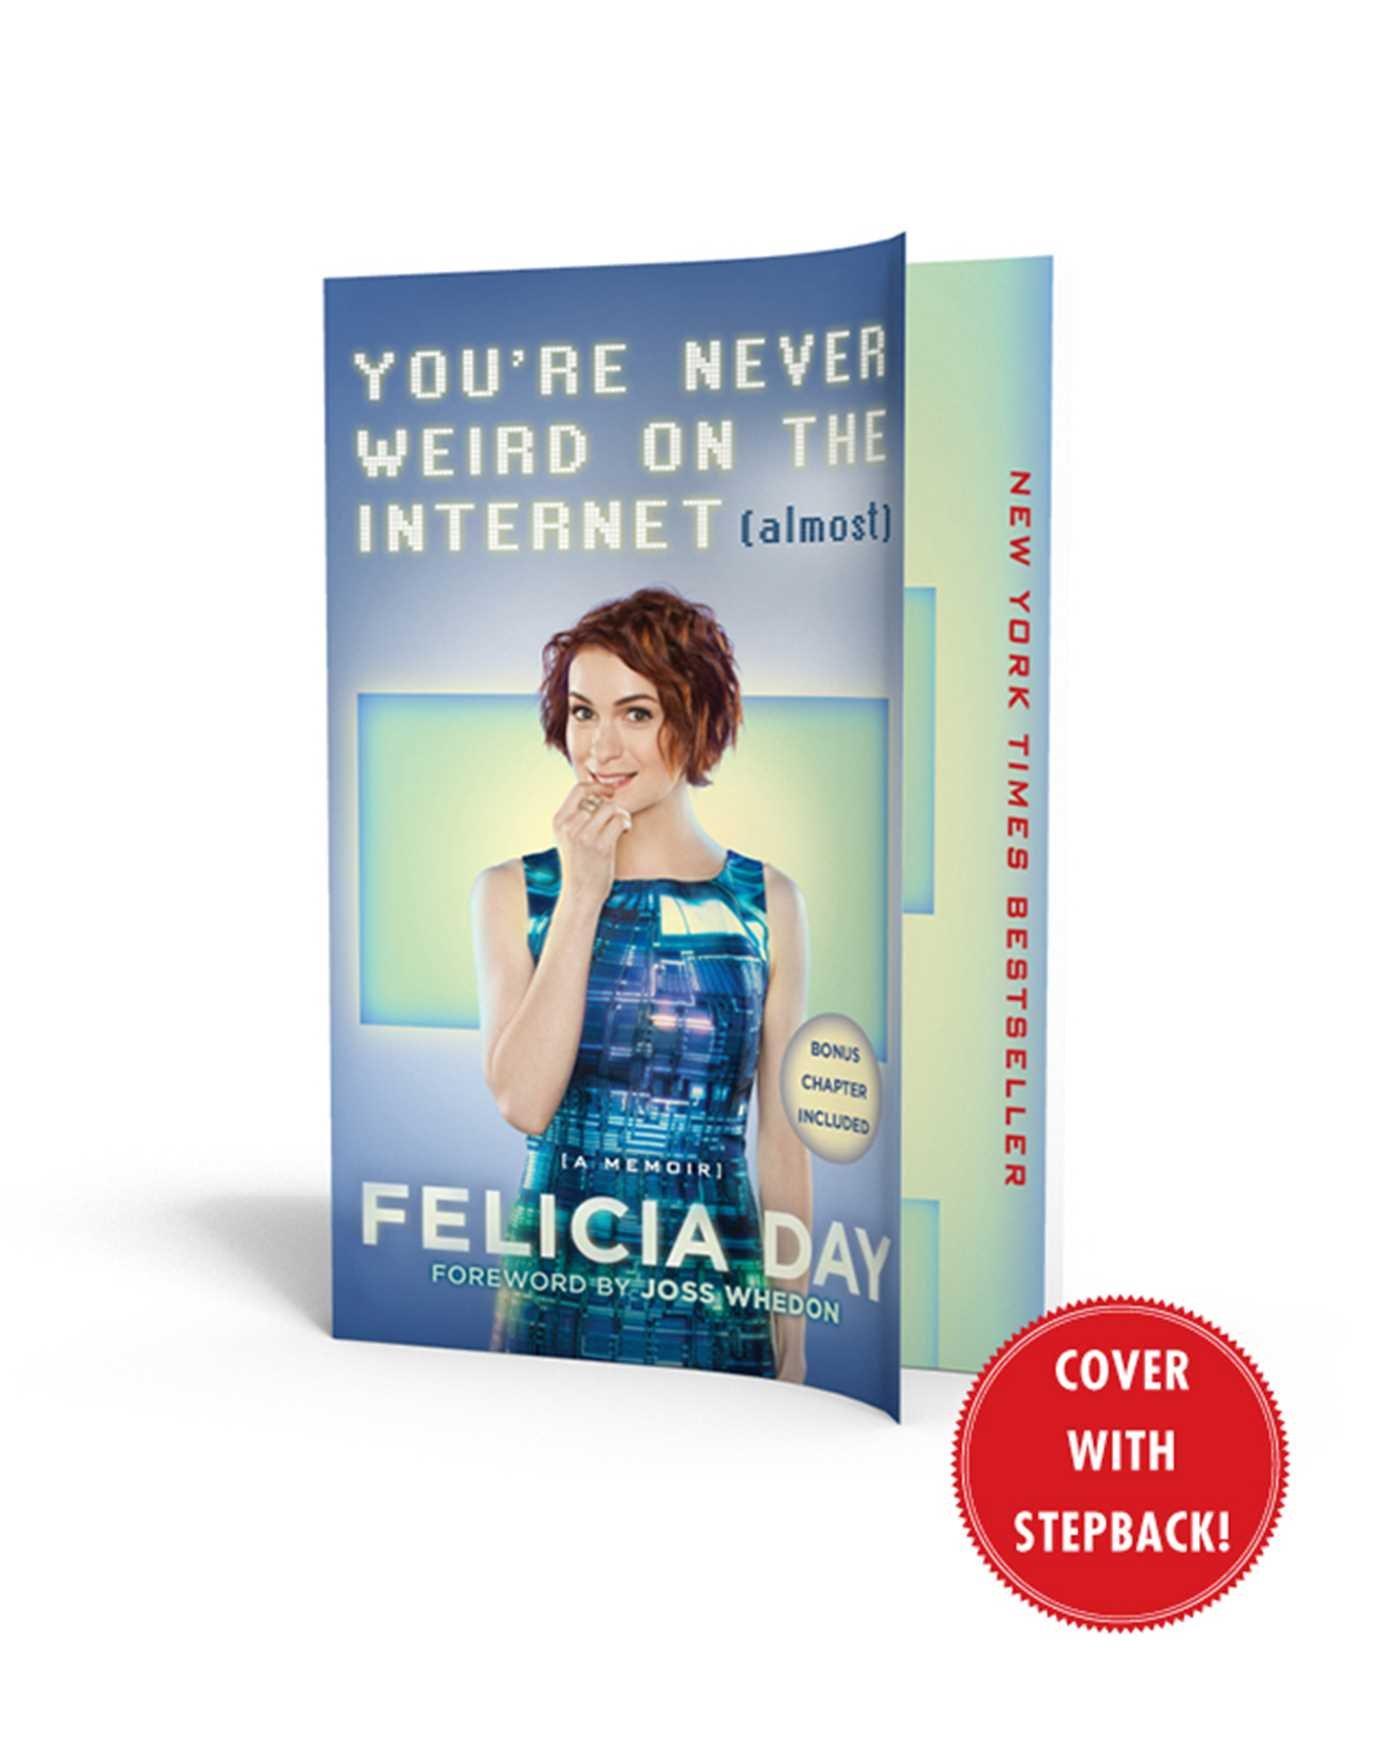 You're Never Weird On The Internet (almost): A Memoir: Felicia Day, Joss  Whedon: 9781476785660: Amazon: Books